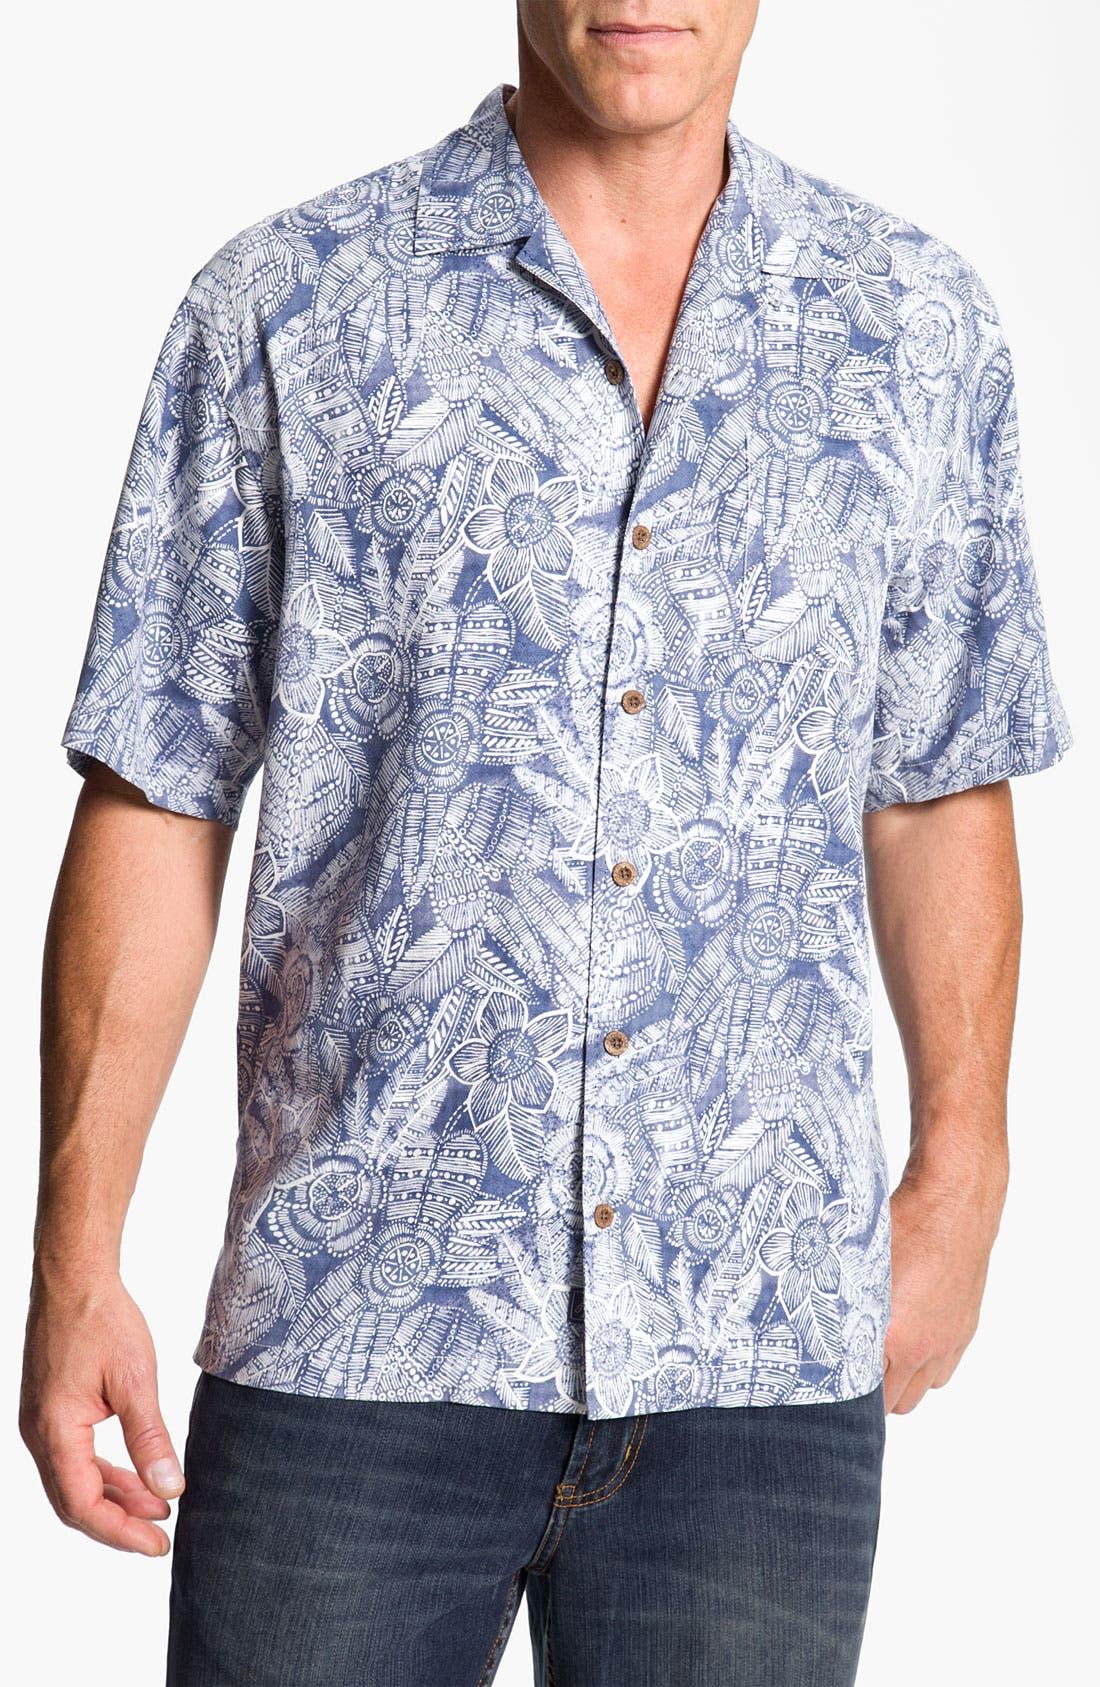 Main Image - Tommy Bahama 'Bou-Teak Floral' Silk Campshirt